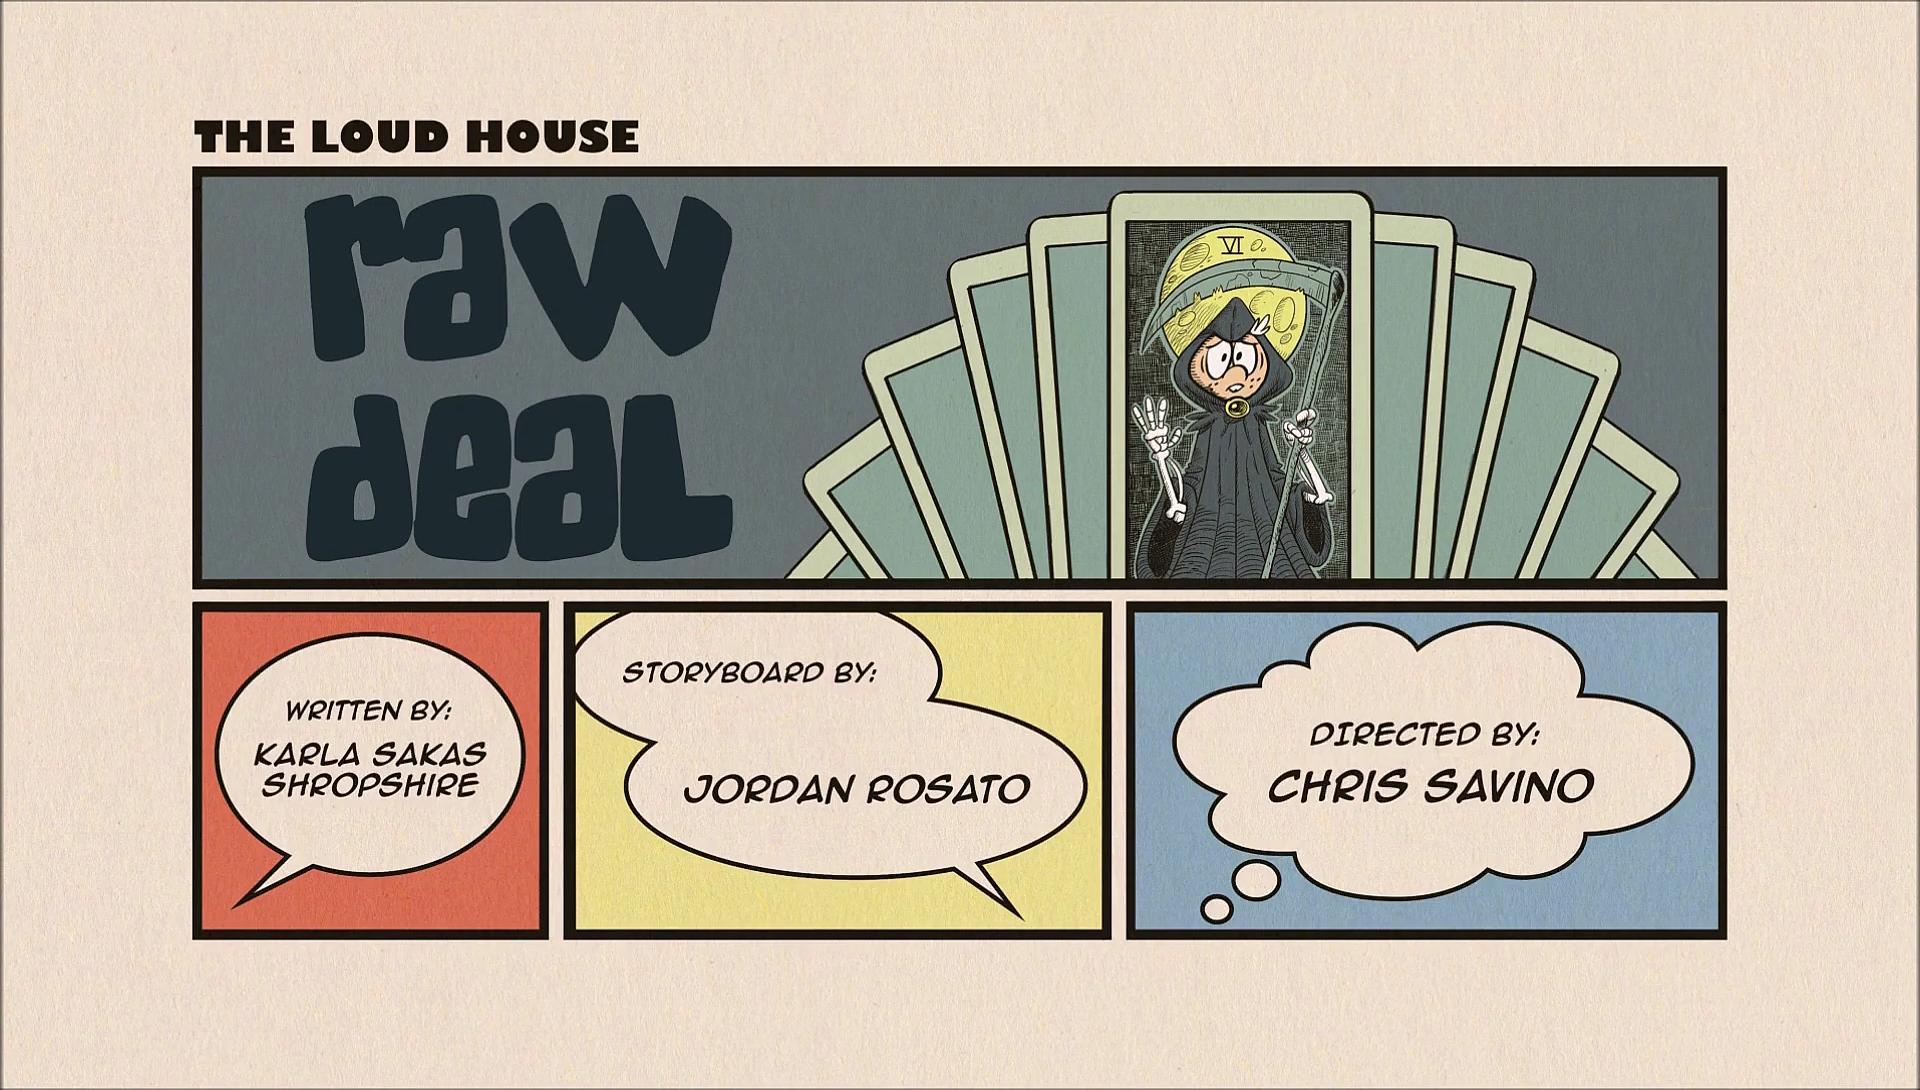 Raw Deal The Loud House Encyclopedia FANDOM powered by